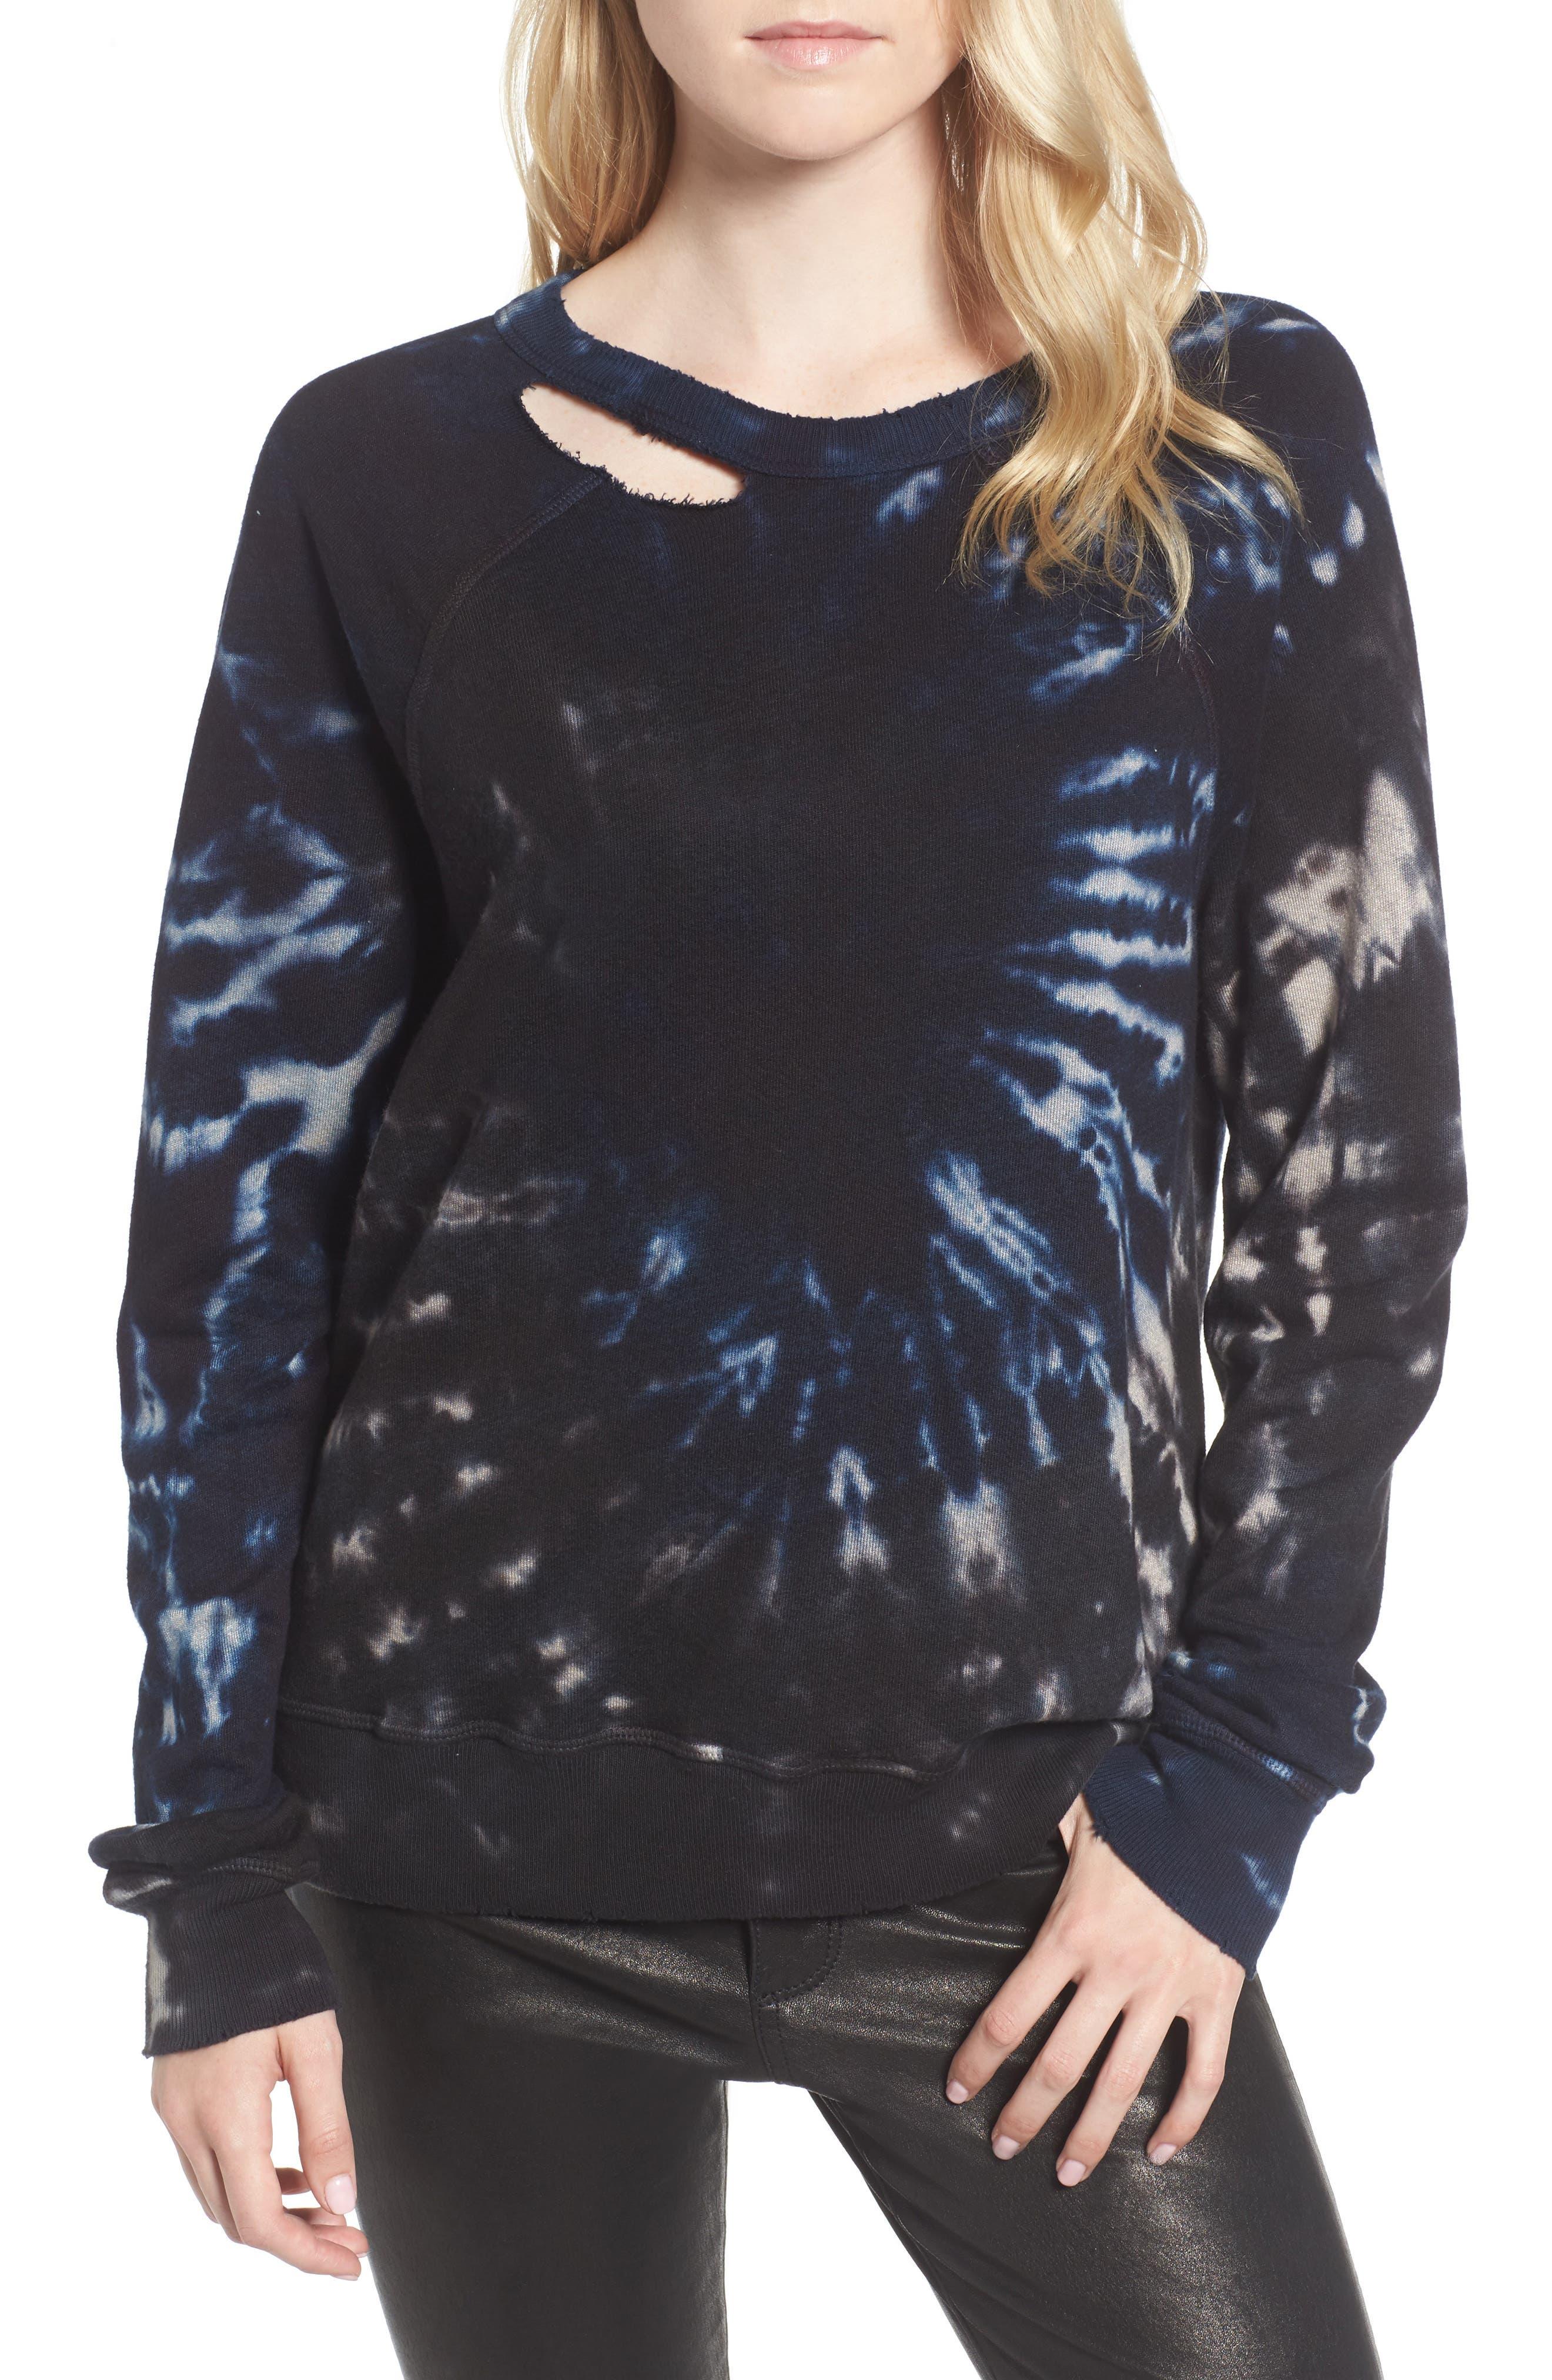 Nic Distressed Sweatshirt,                         Main,                         color, 010